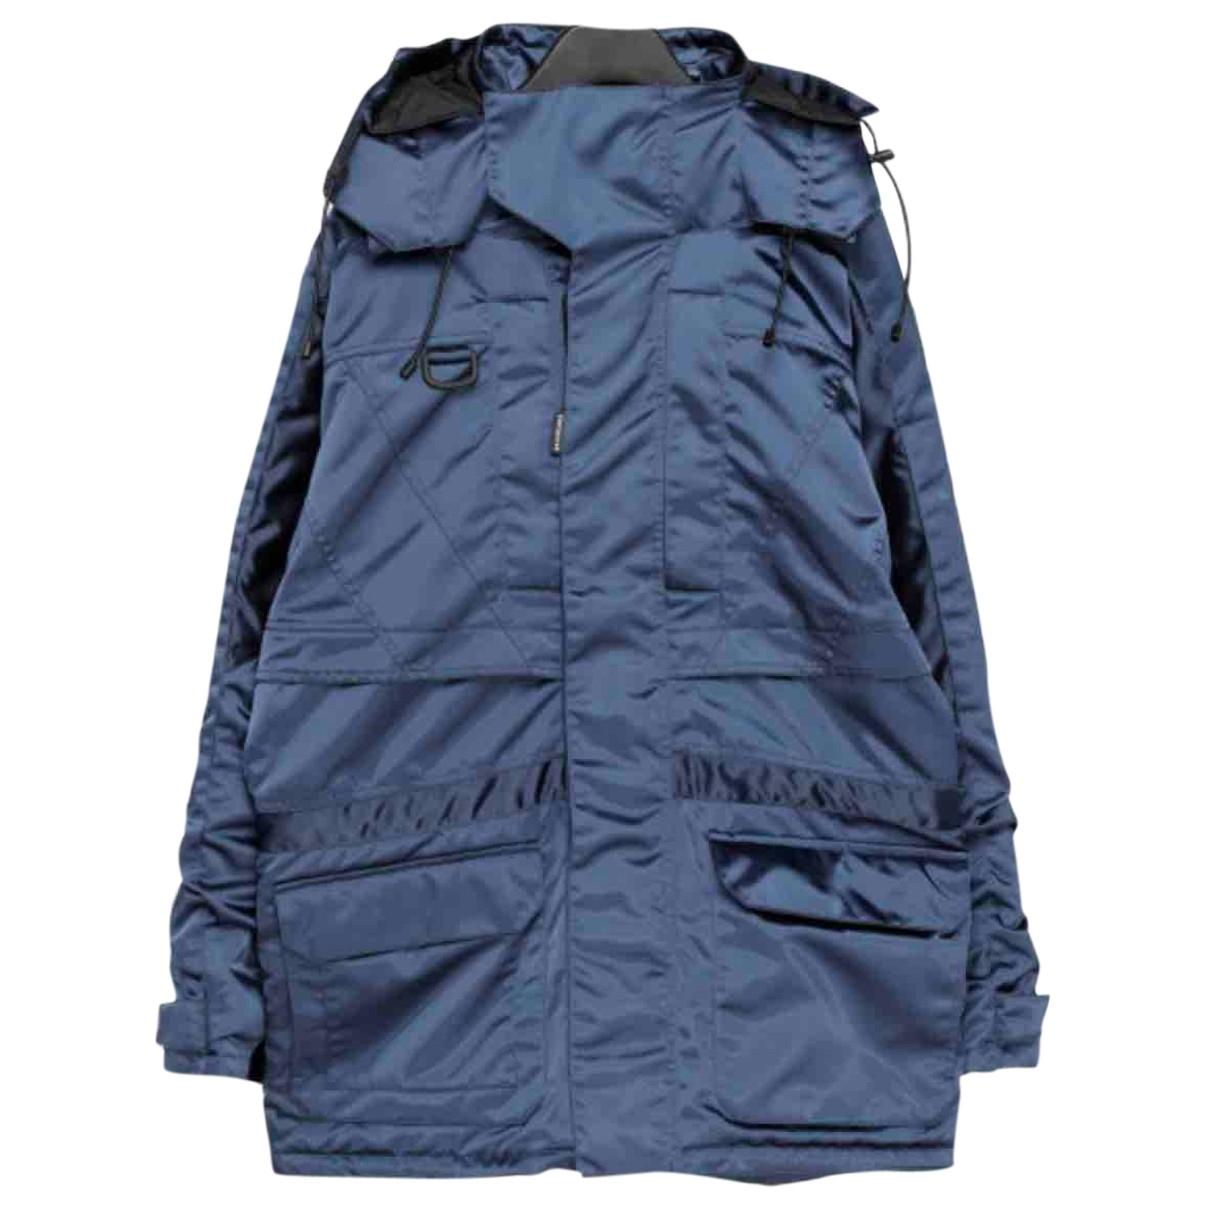 Balenciaga - Vestes.Blousons   pour homme - bleu